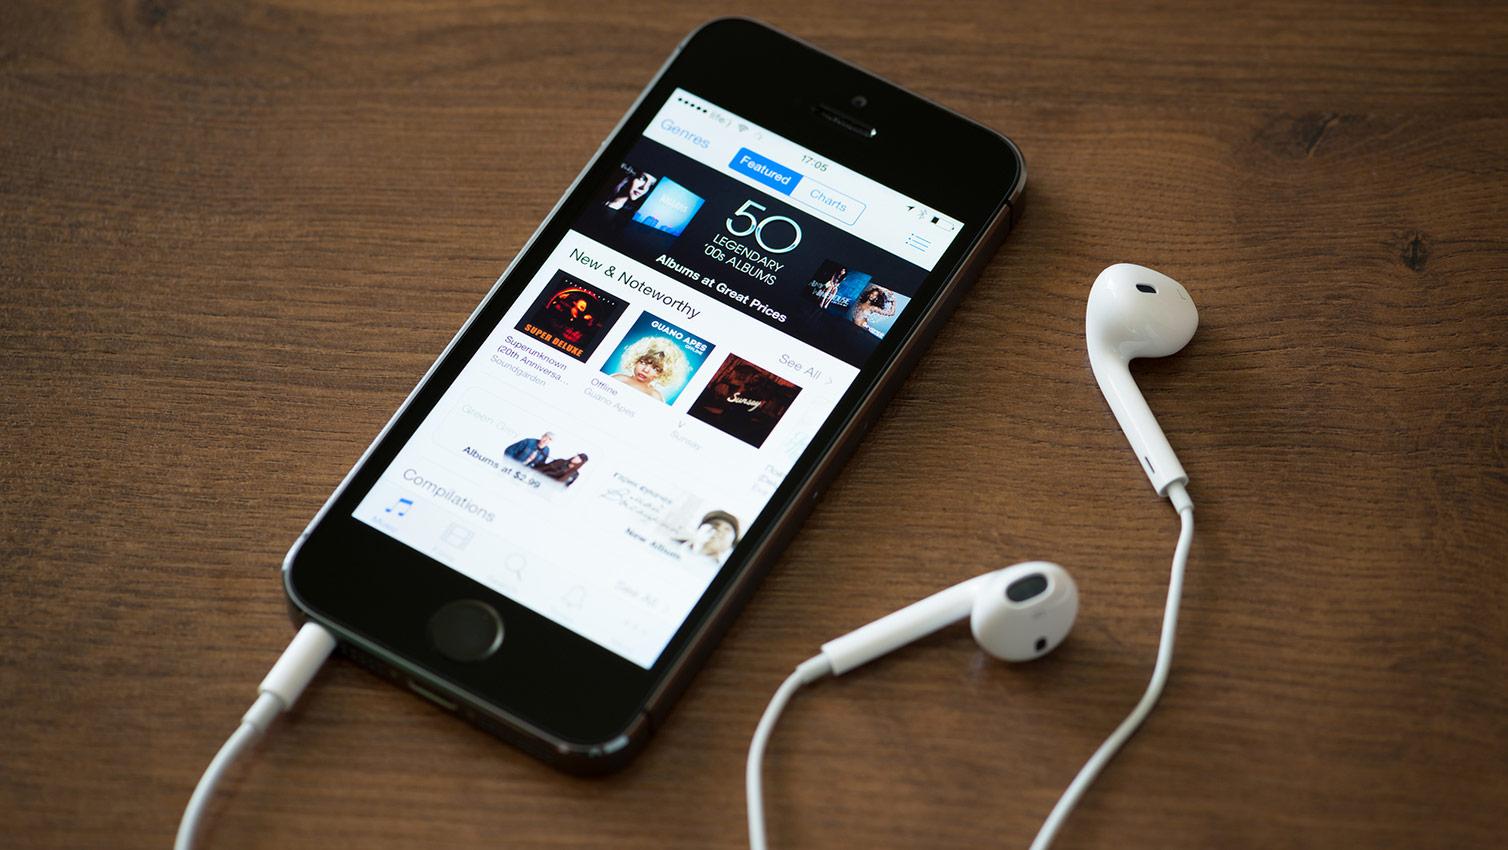 itunes-on-iphone-podcast-headphones-24.jpg